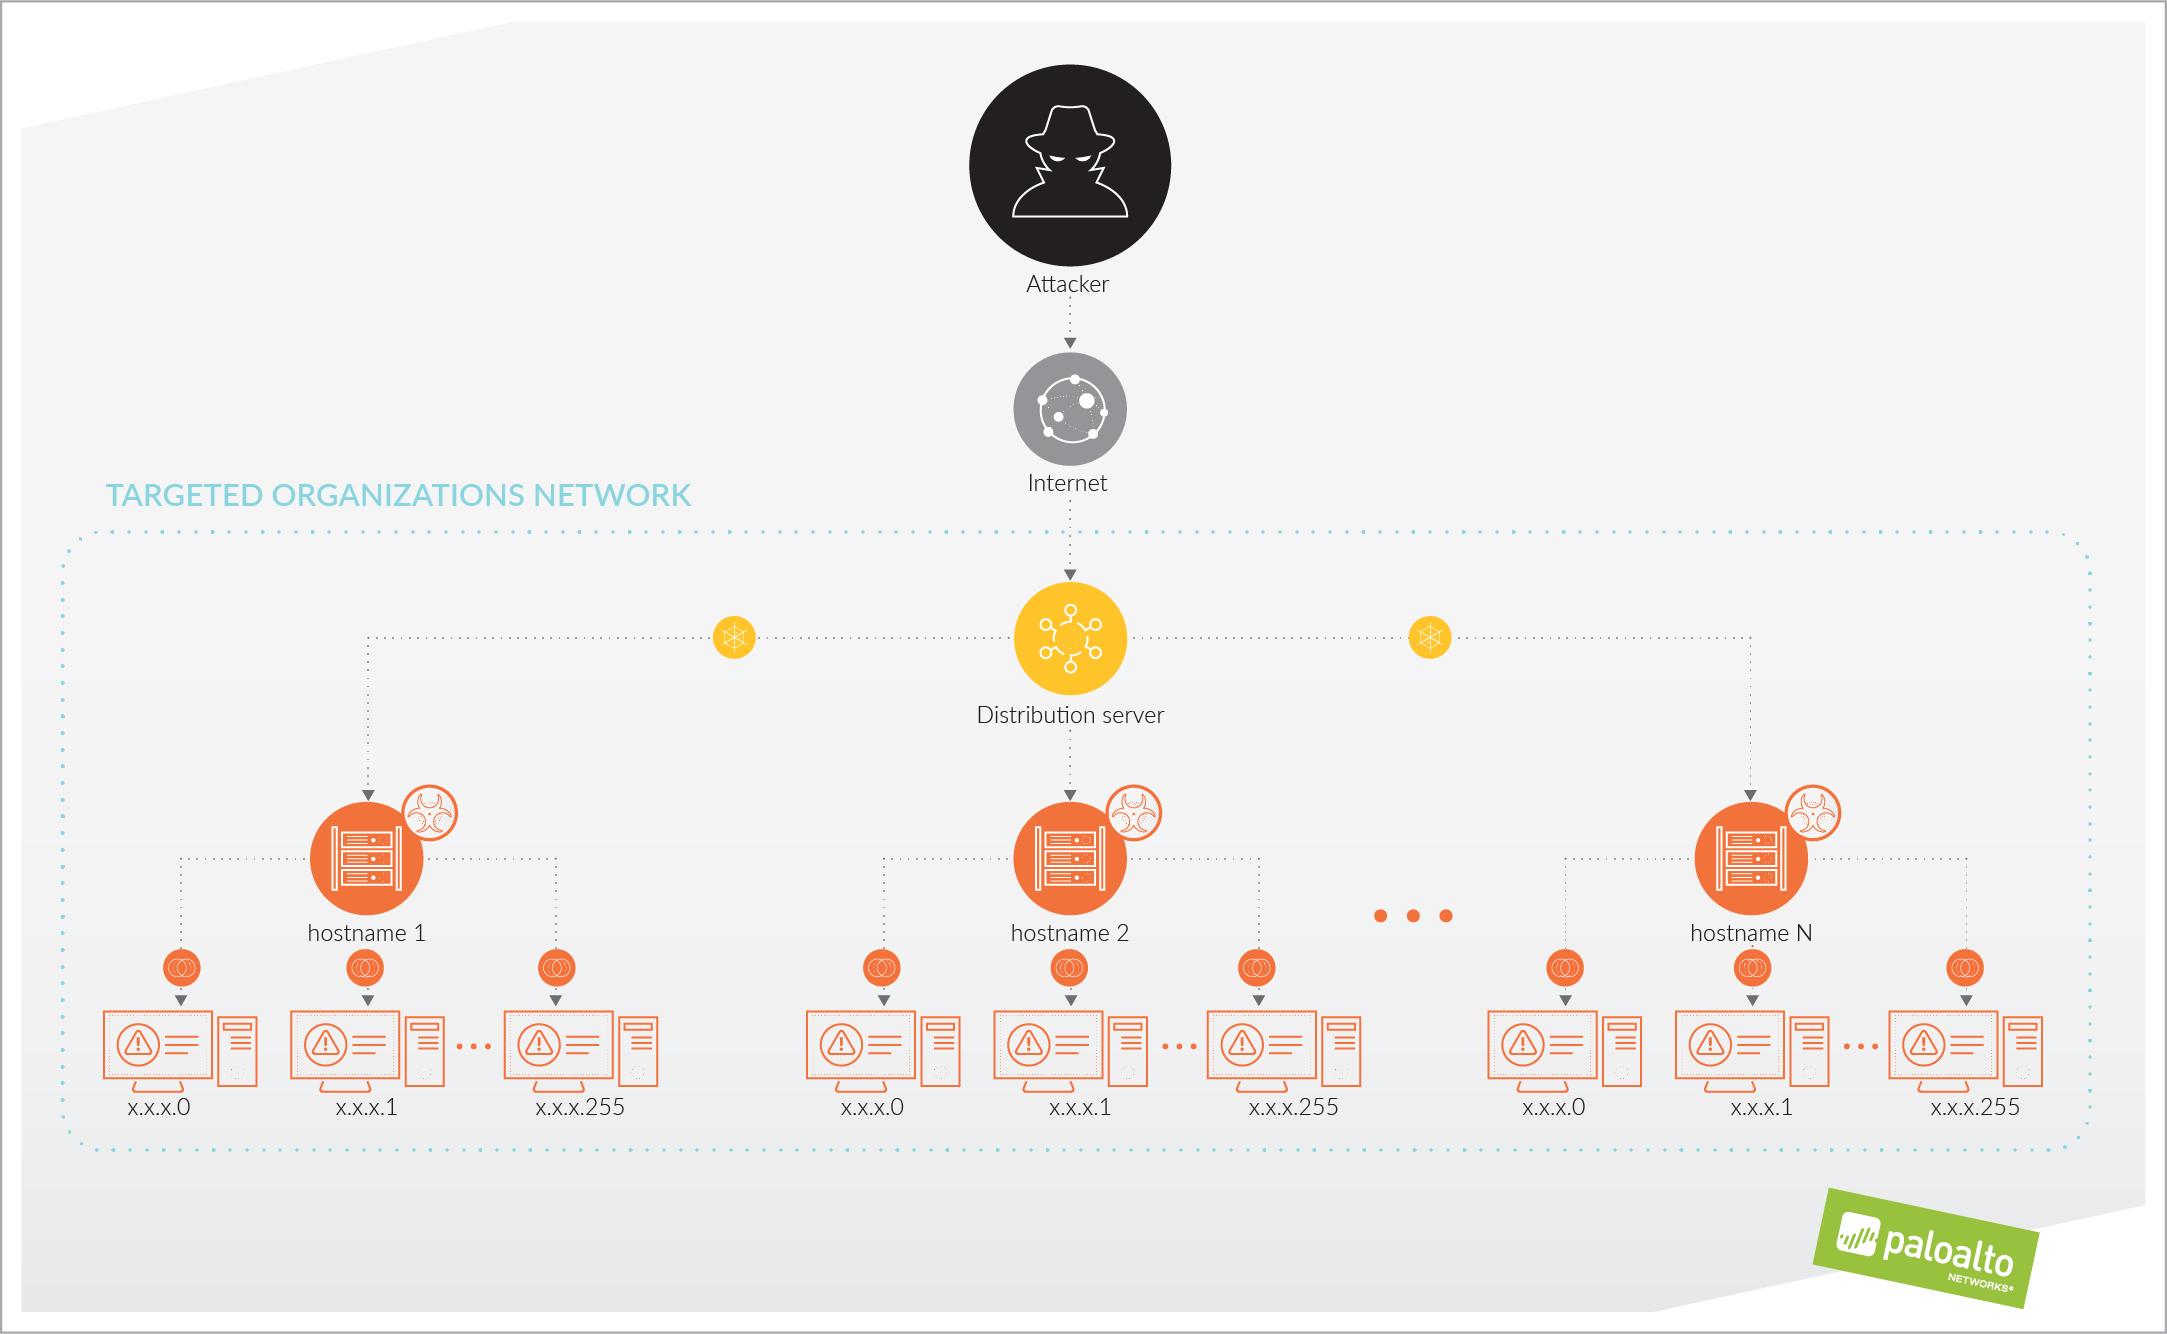 shamoon-diagram-social-ads-final_unit-42-diagram-linkedin-520x320